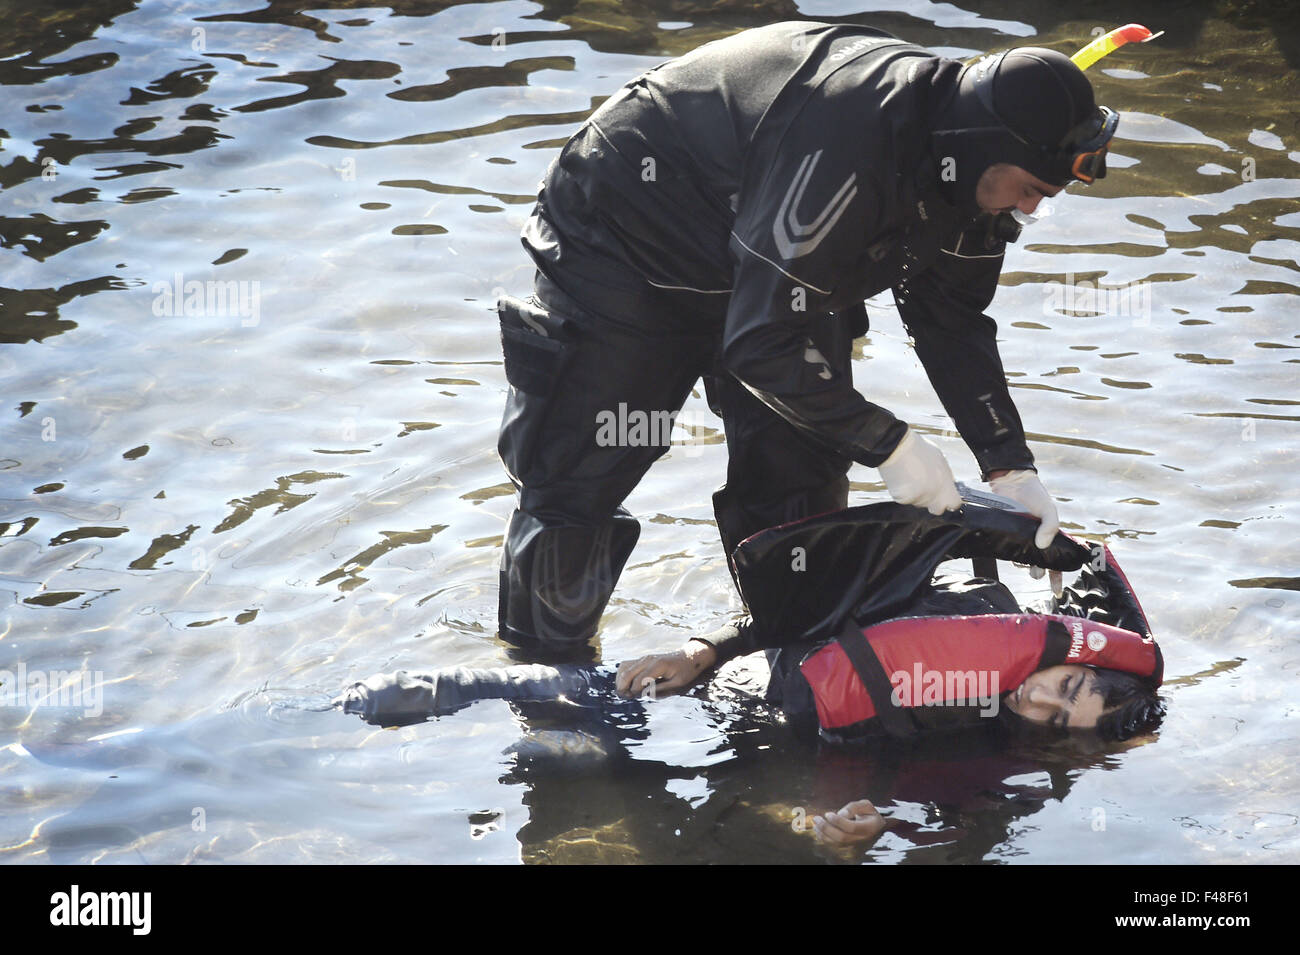 Lesbos, Griechenland. 15. Oktober 2015. Rescue Diver nimmt ein totes ...